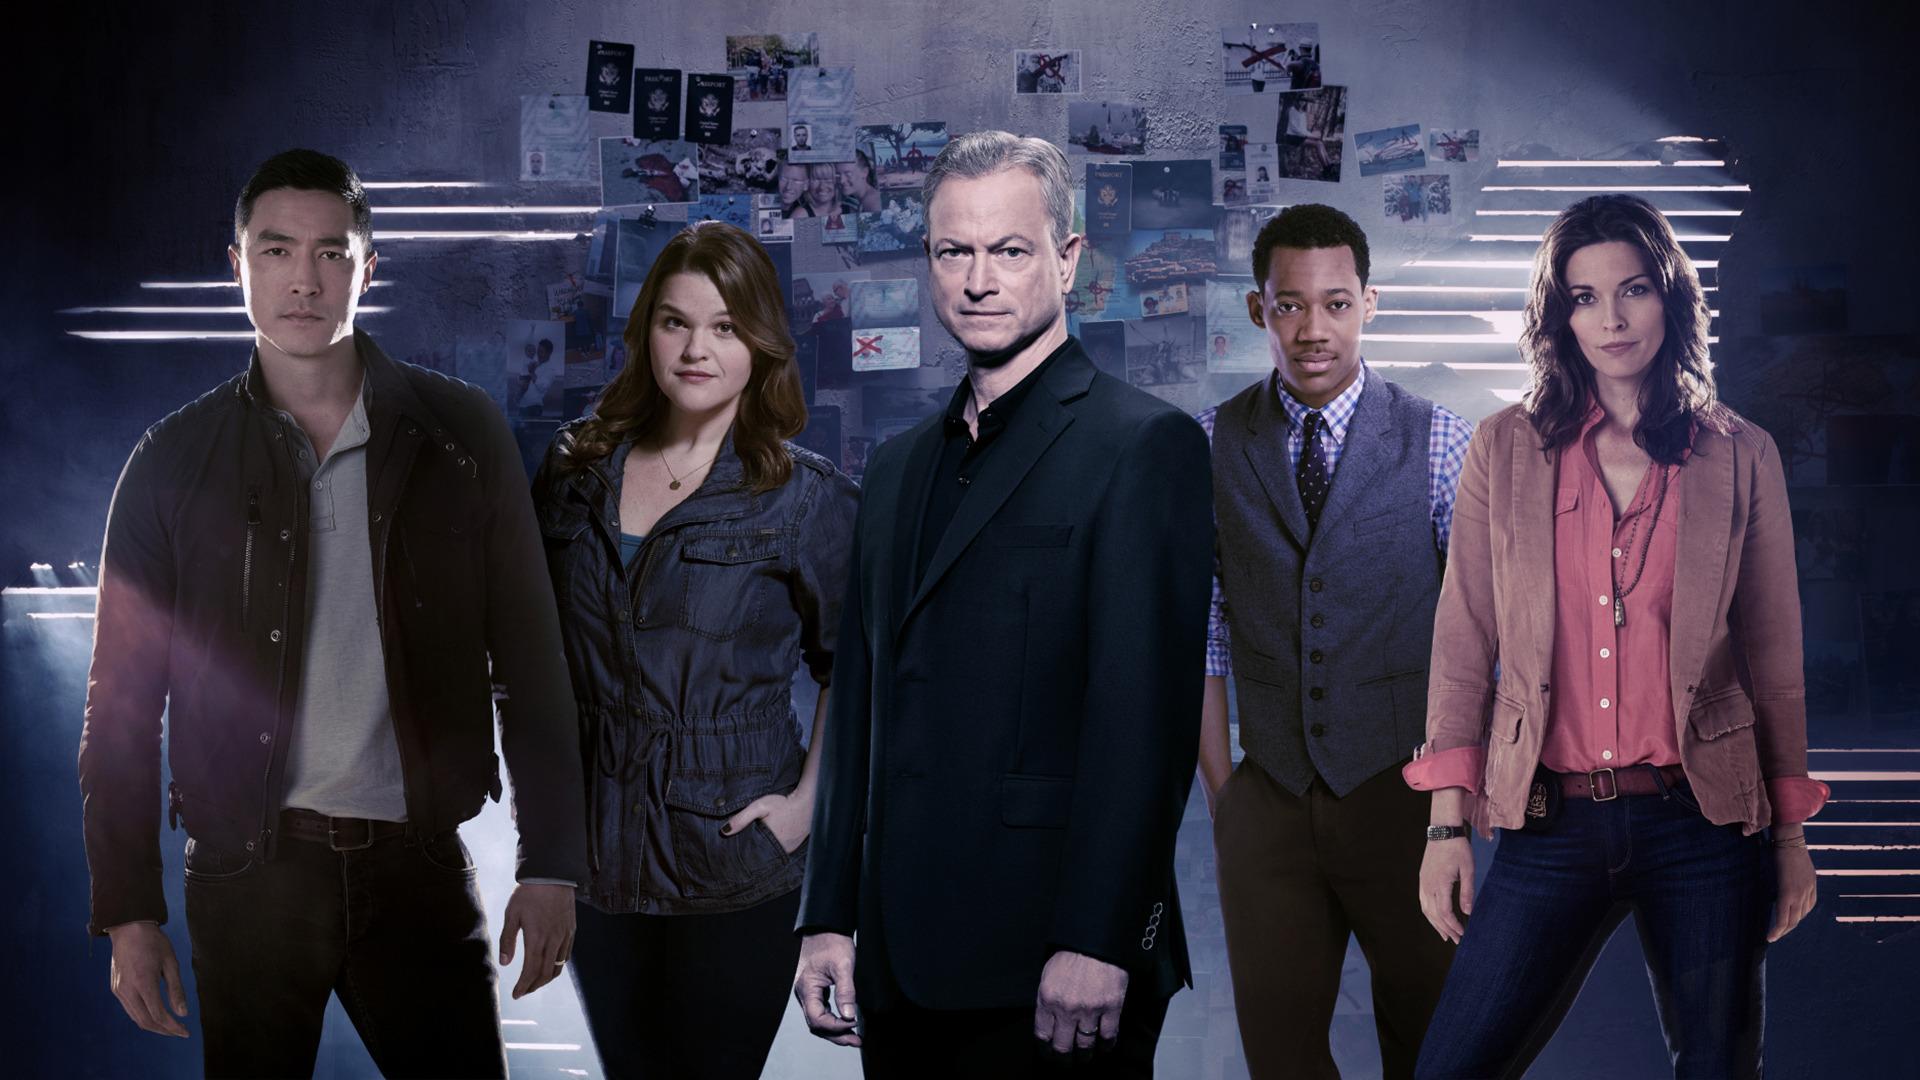 Show Criminal Minds: Beyond Borders